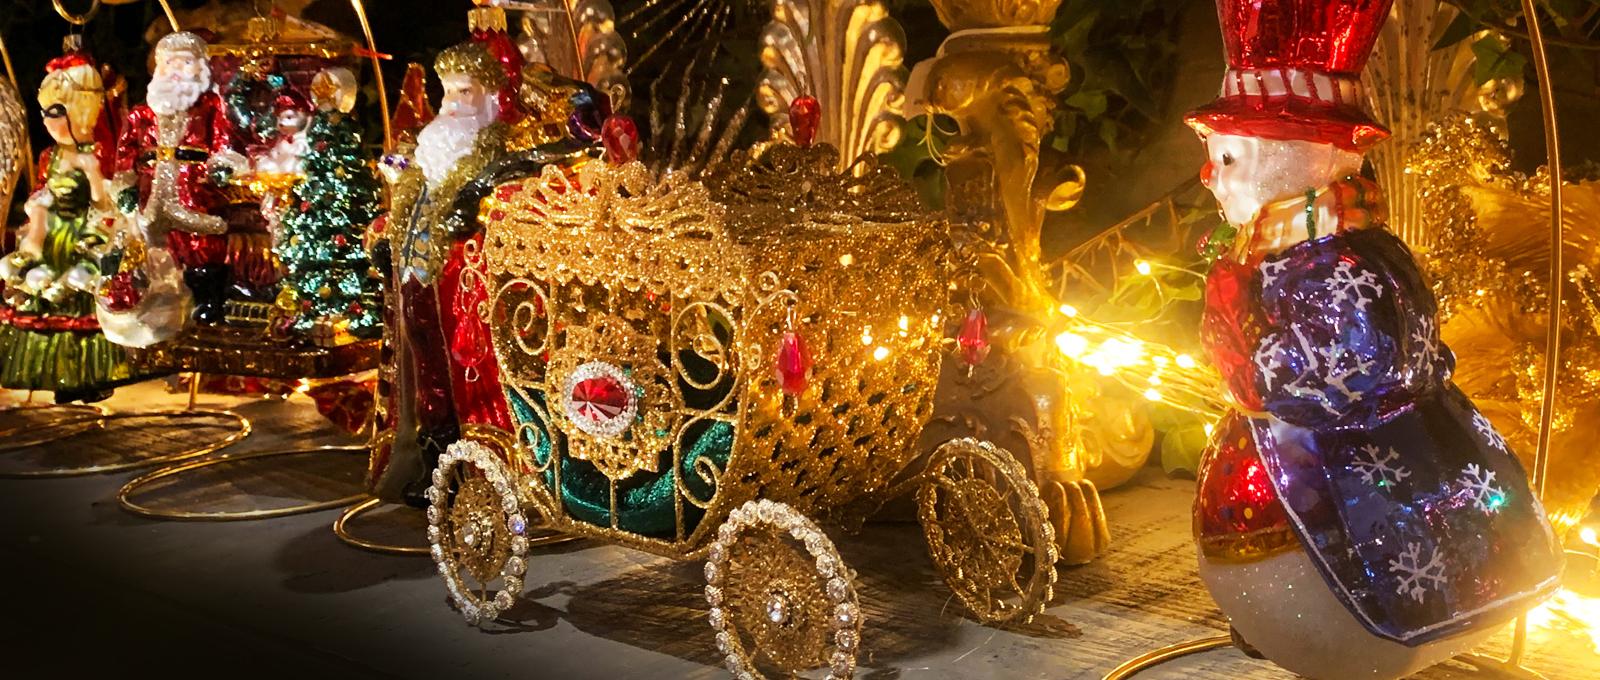 Noël ✨